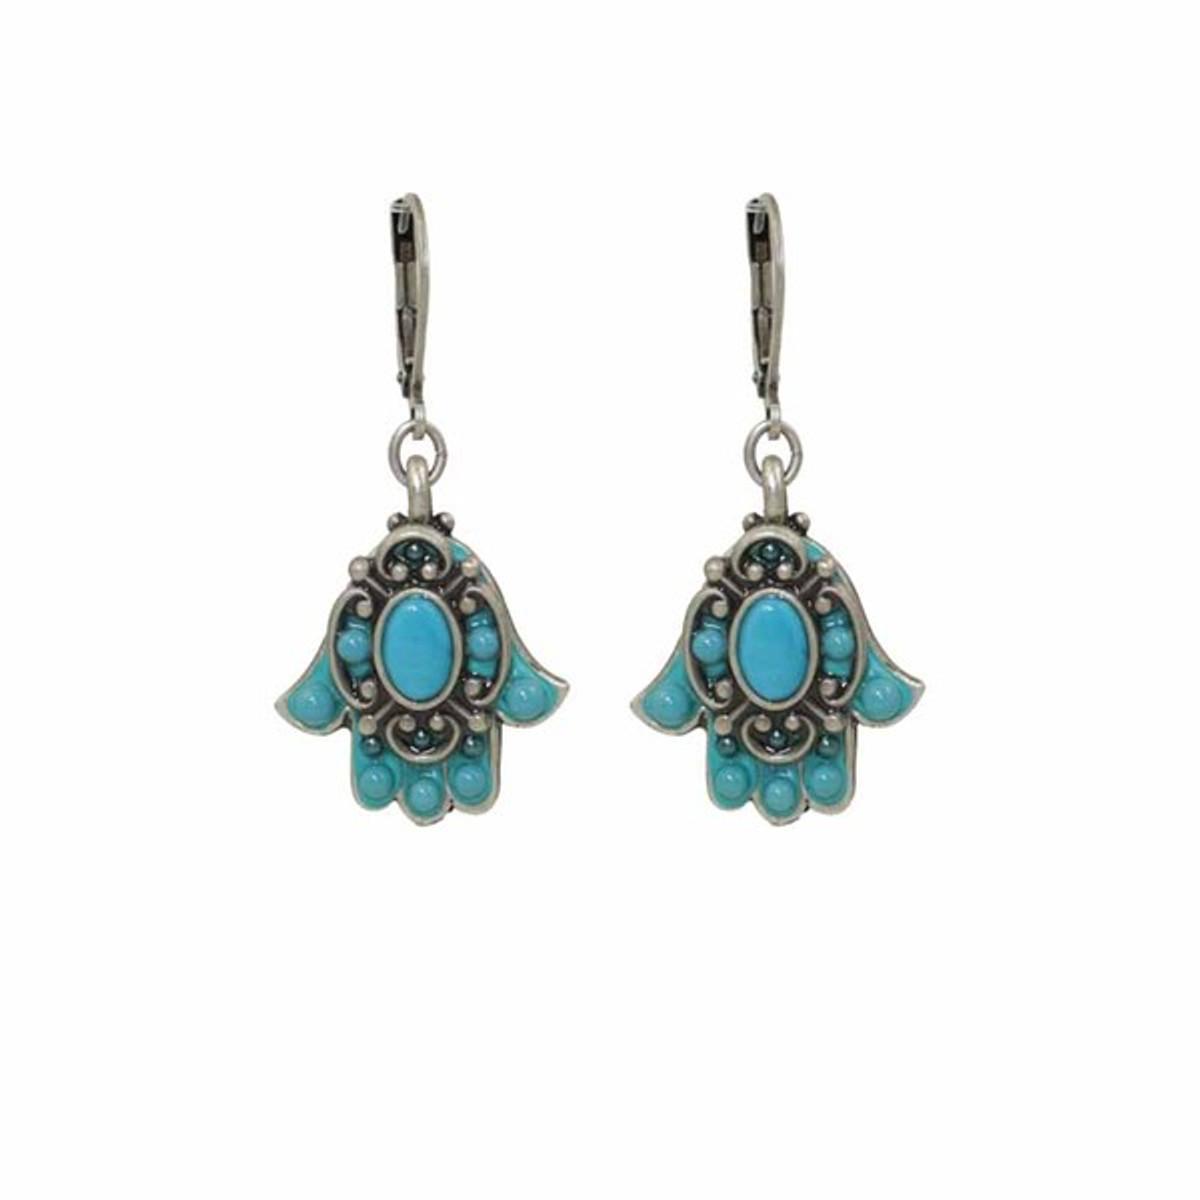 Hamsa earrings from Michal Golan Jewelry